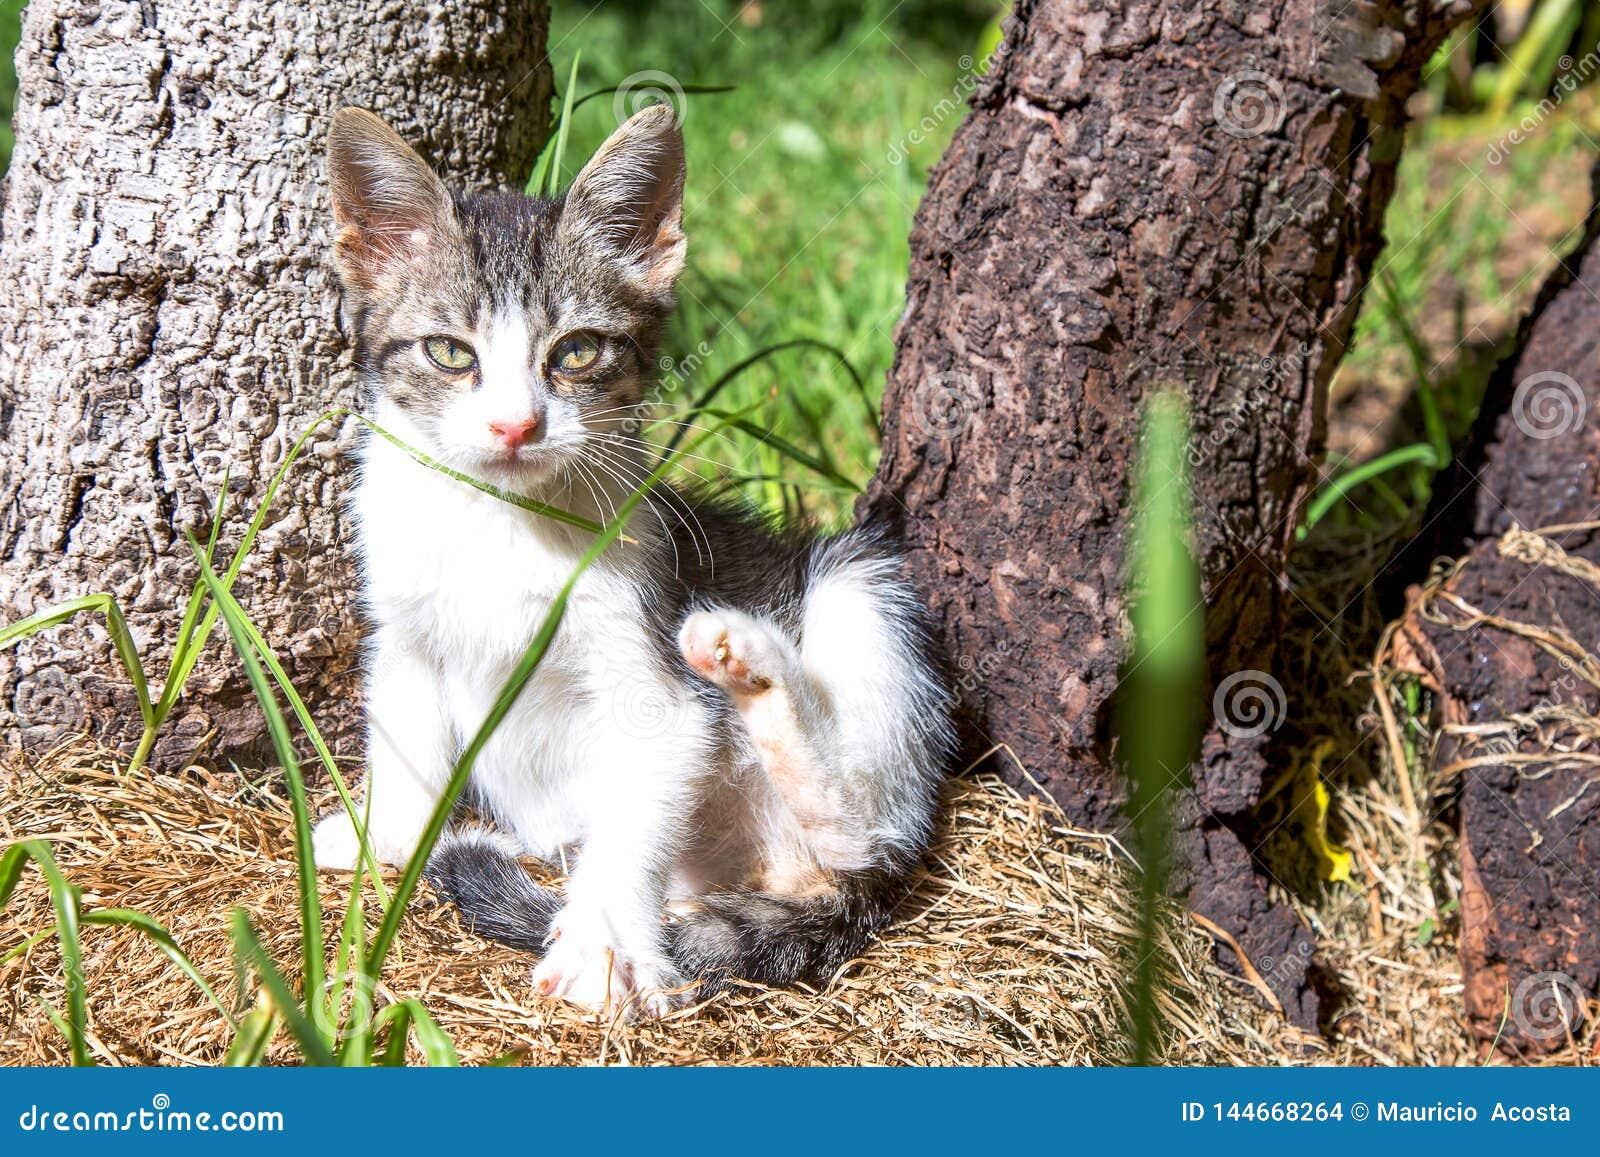 Gattino che prova a graffiarsi